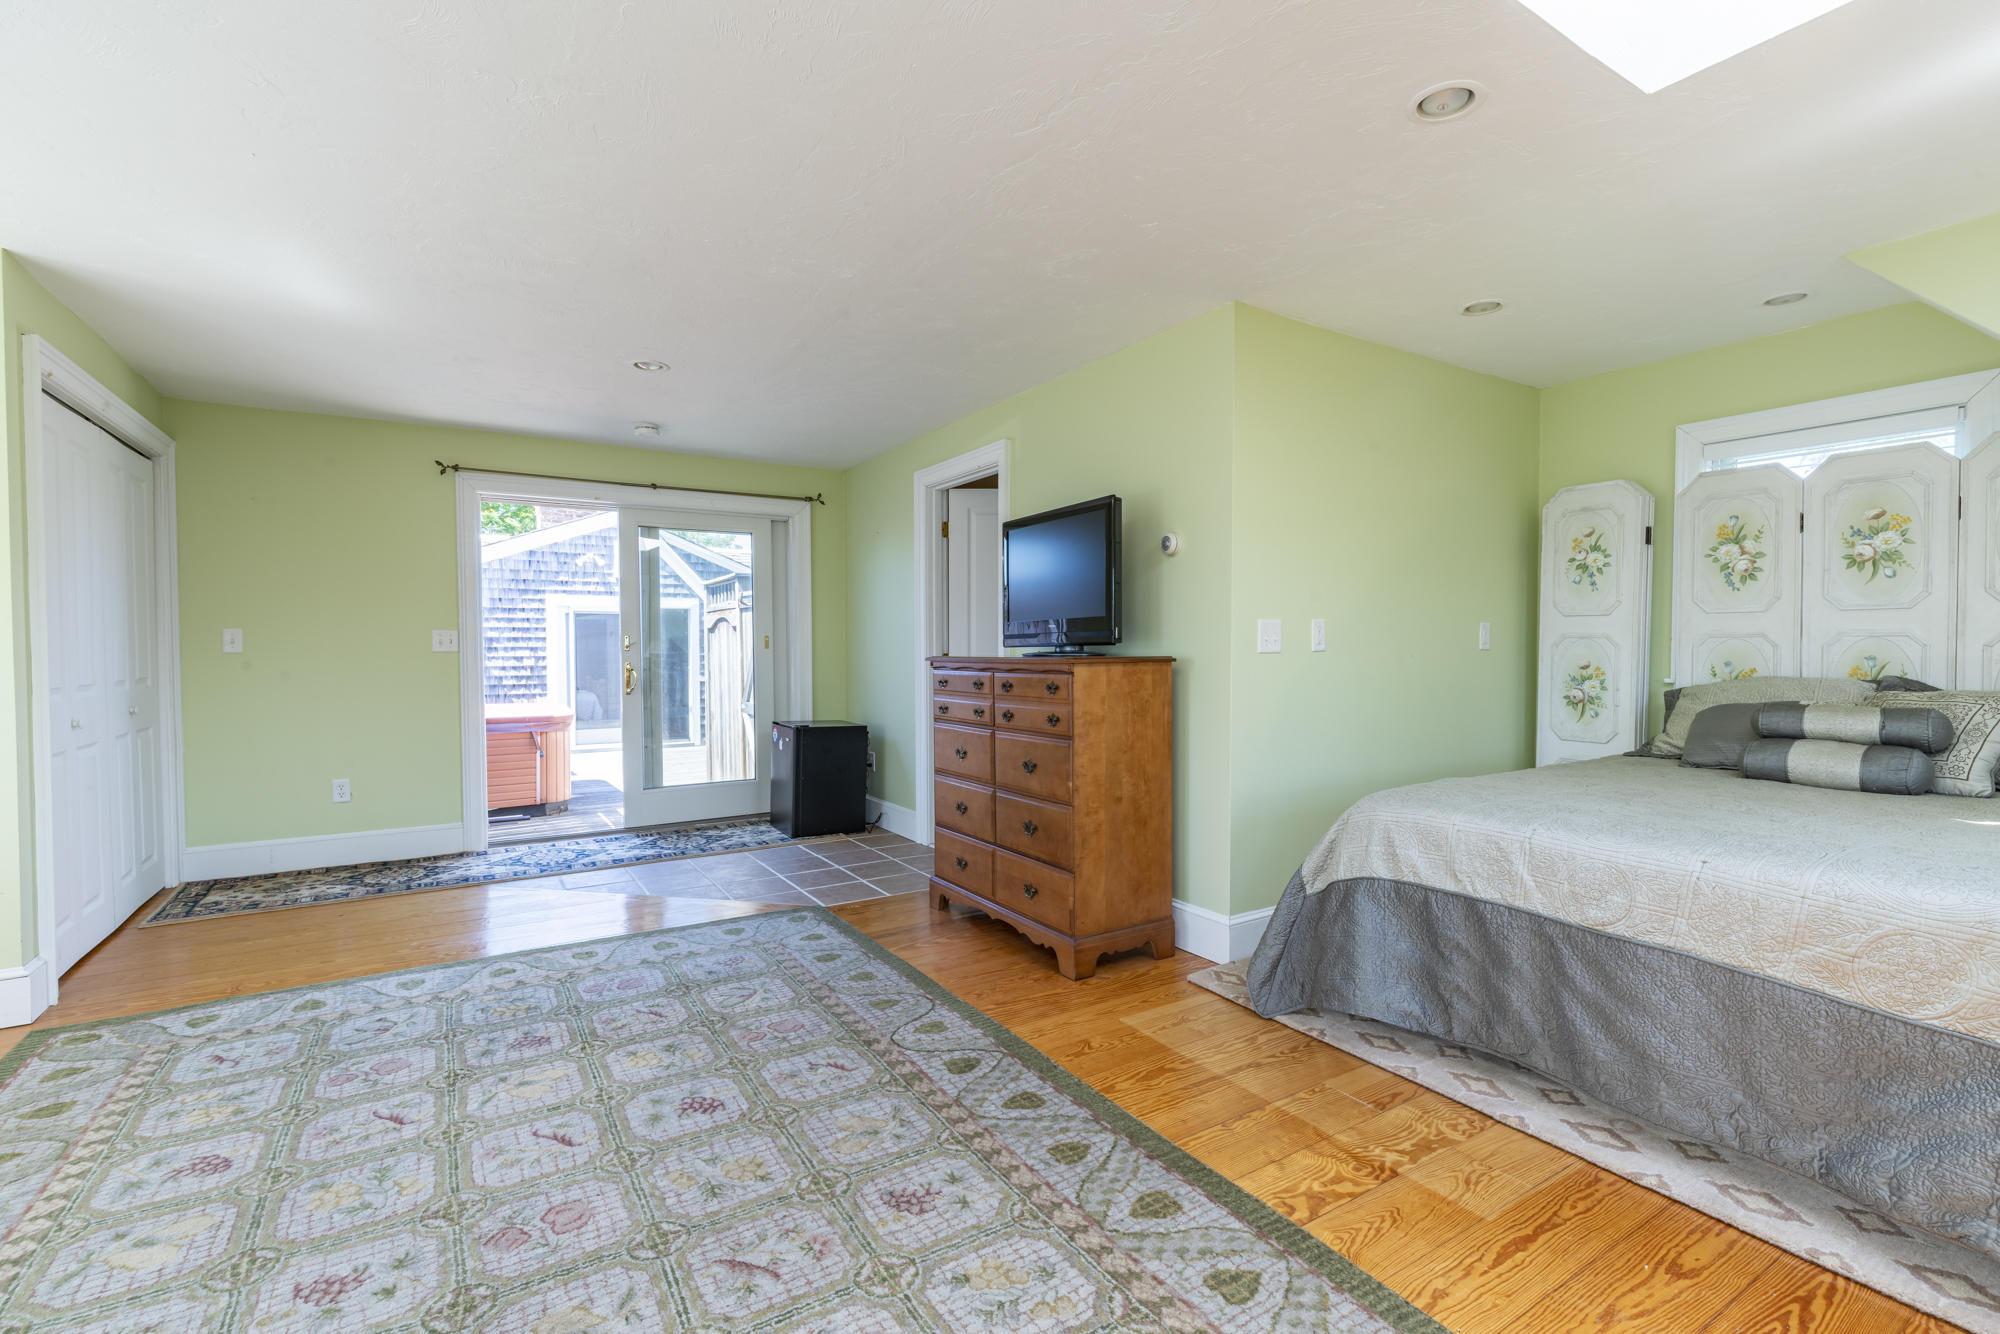 90 Seaview Street, Chatham, MA  02633 - slide 33